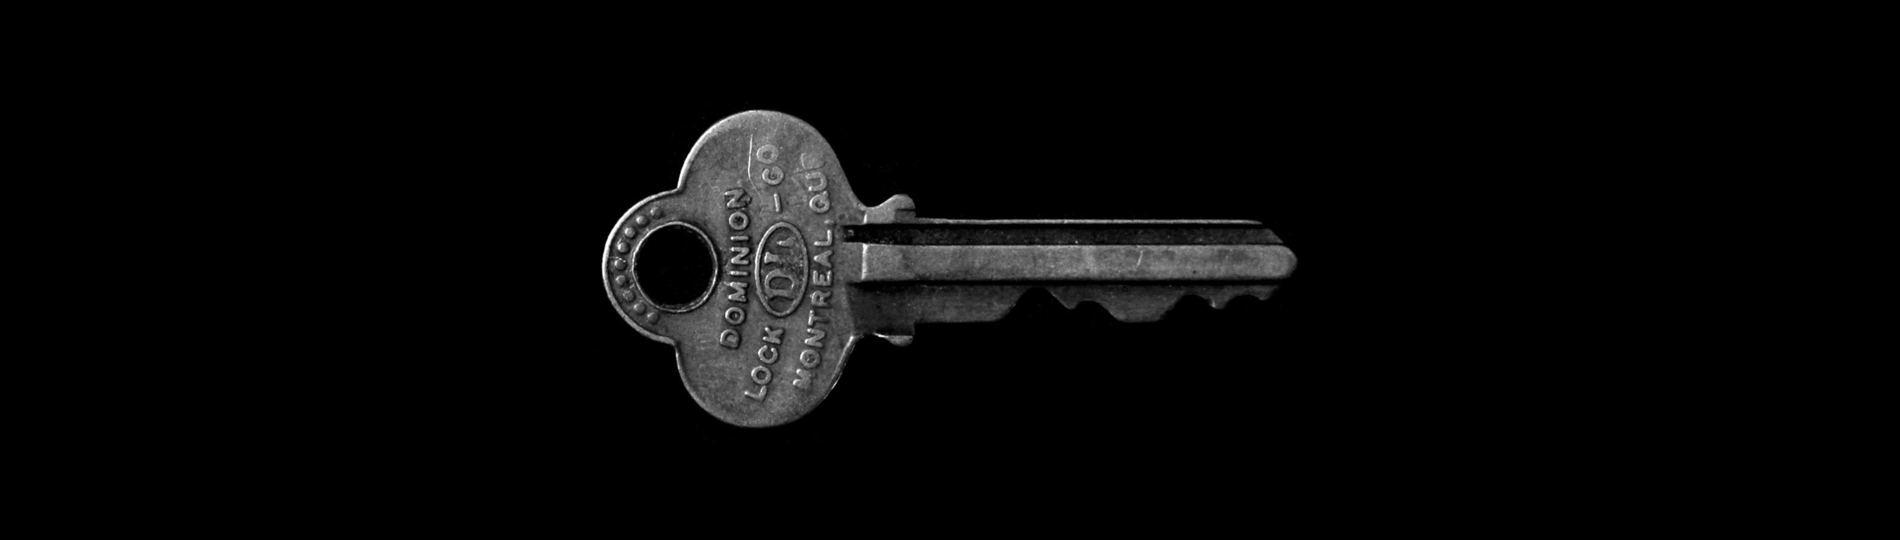 Dominion key